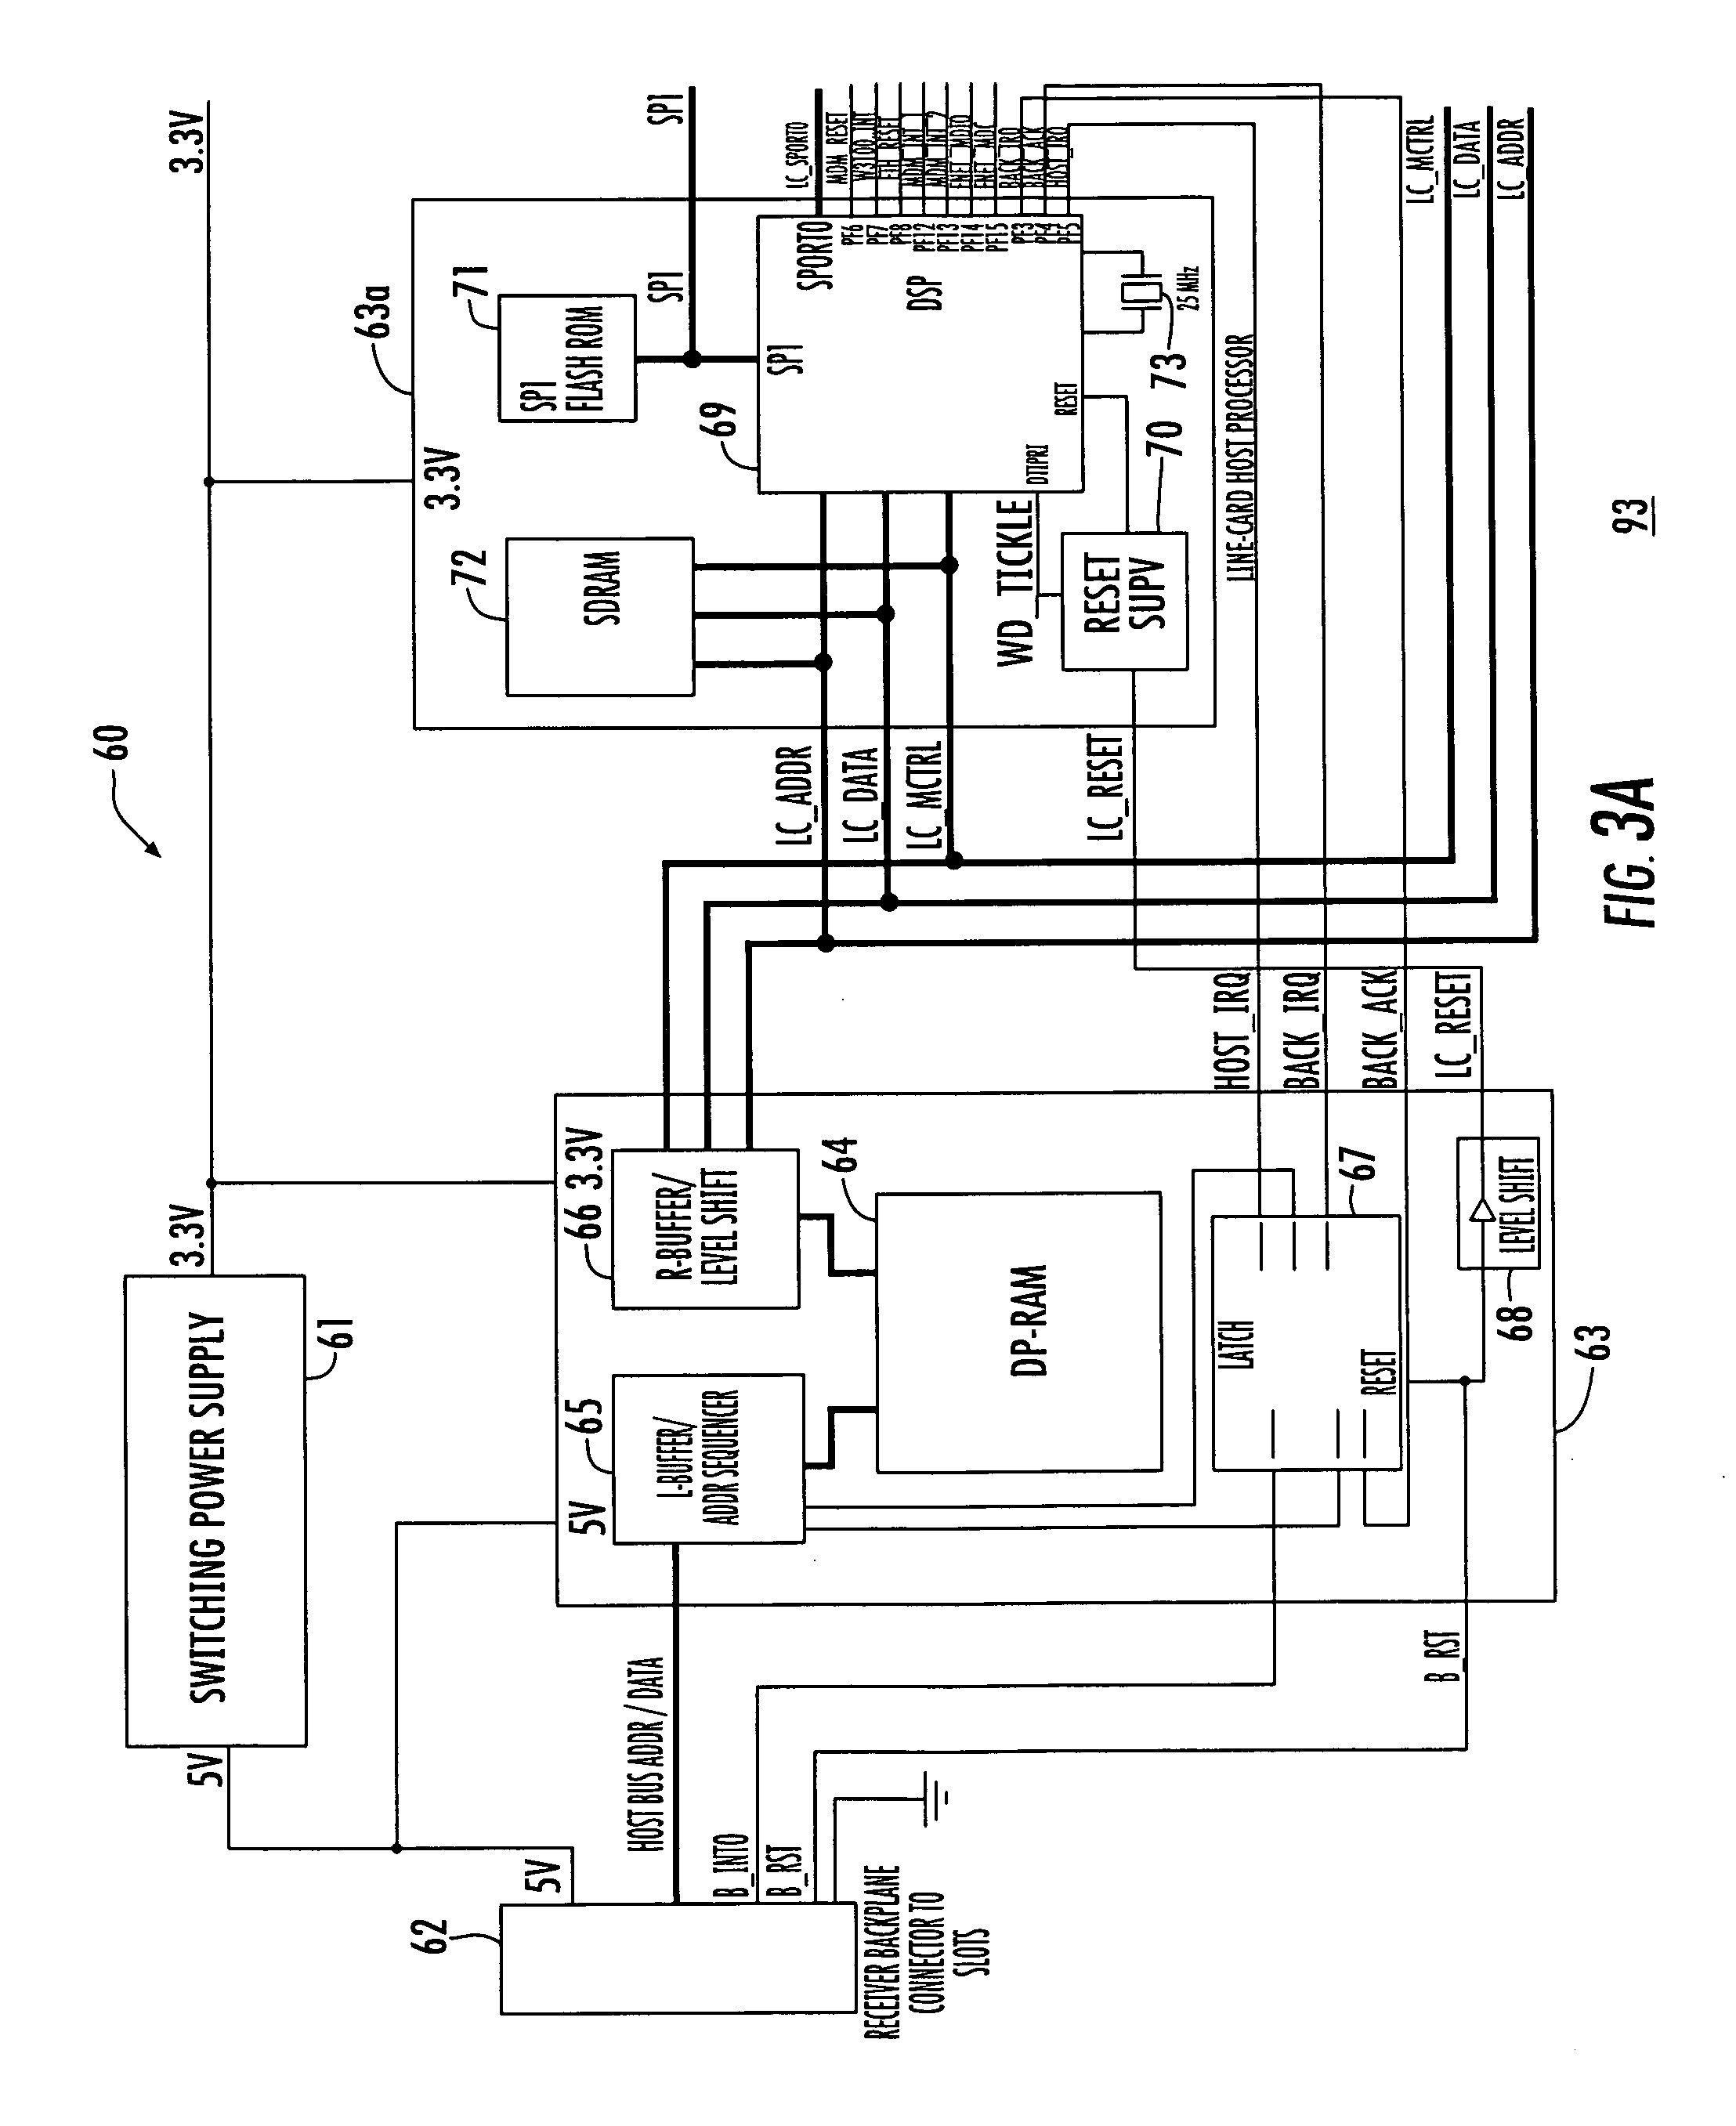 XF_1577] Fire Alarm System Wiring Diagram On Fire Alarm Schematic Diagram  Download DiagramCette Numdin Xeira Sputa Puti Pila Carn Weasi Estep Wigeg Mohammedshrine  Librar Wiring 101